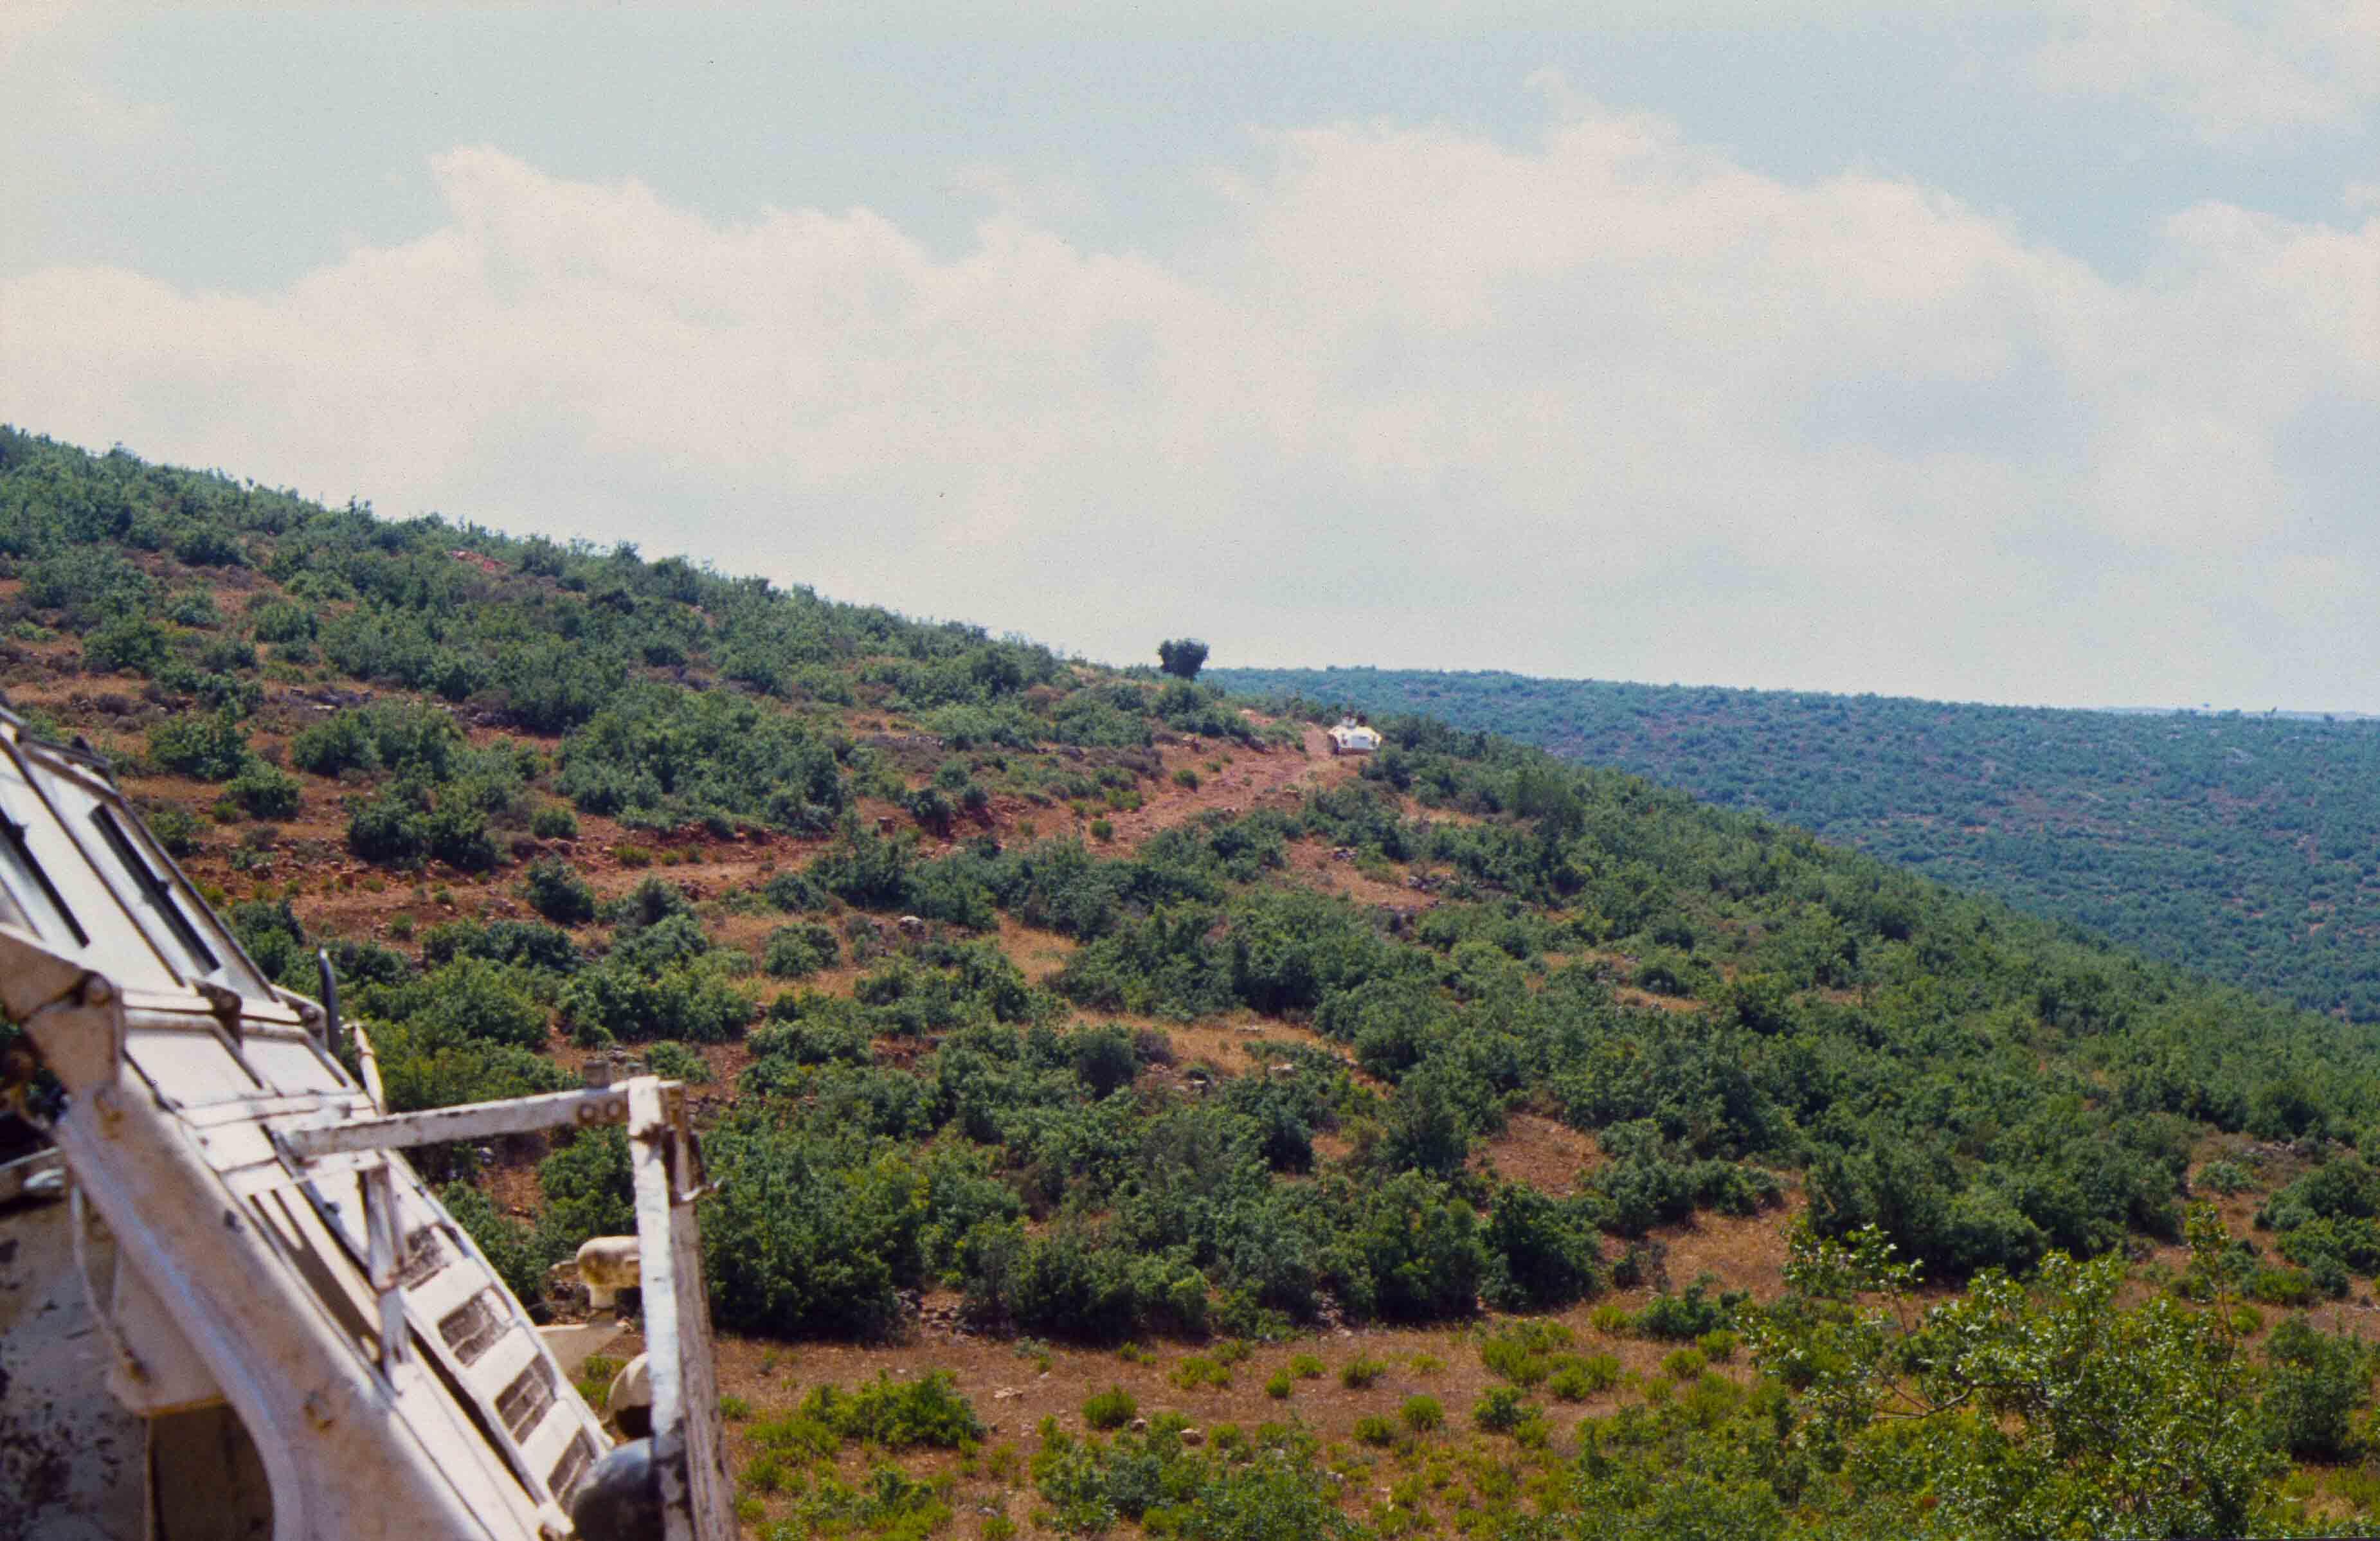 120. Libanon